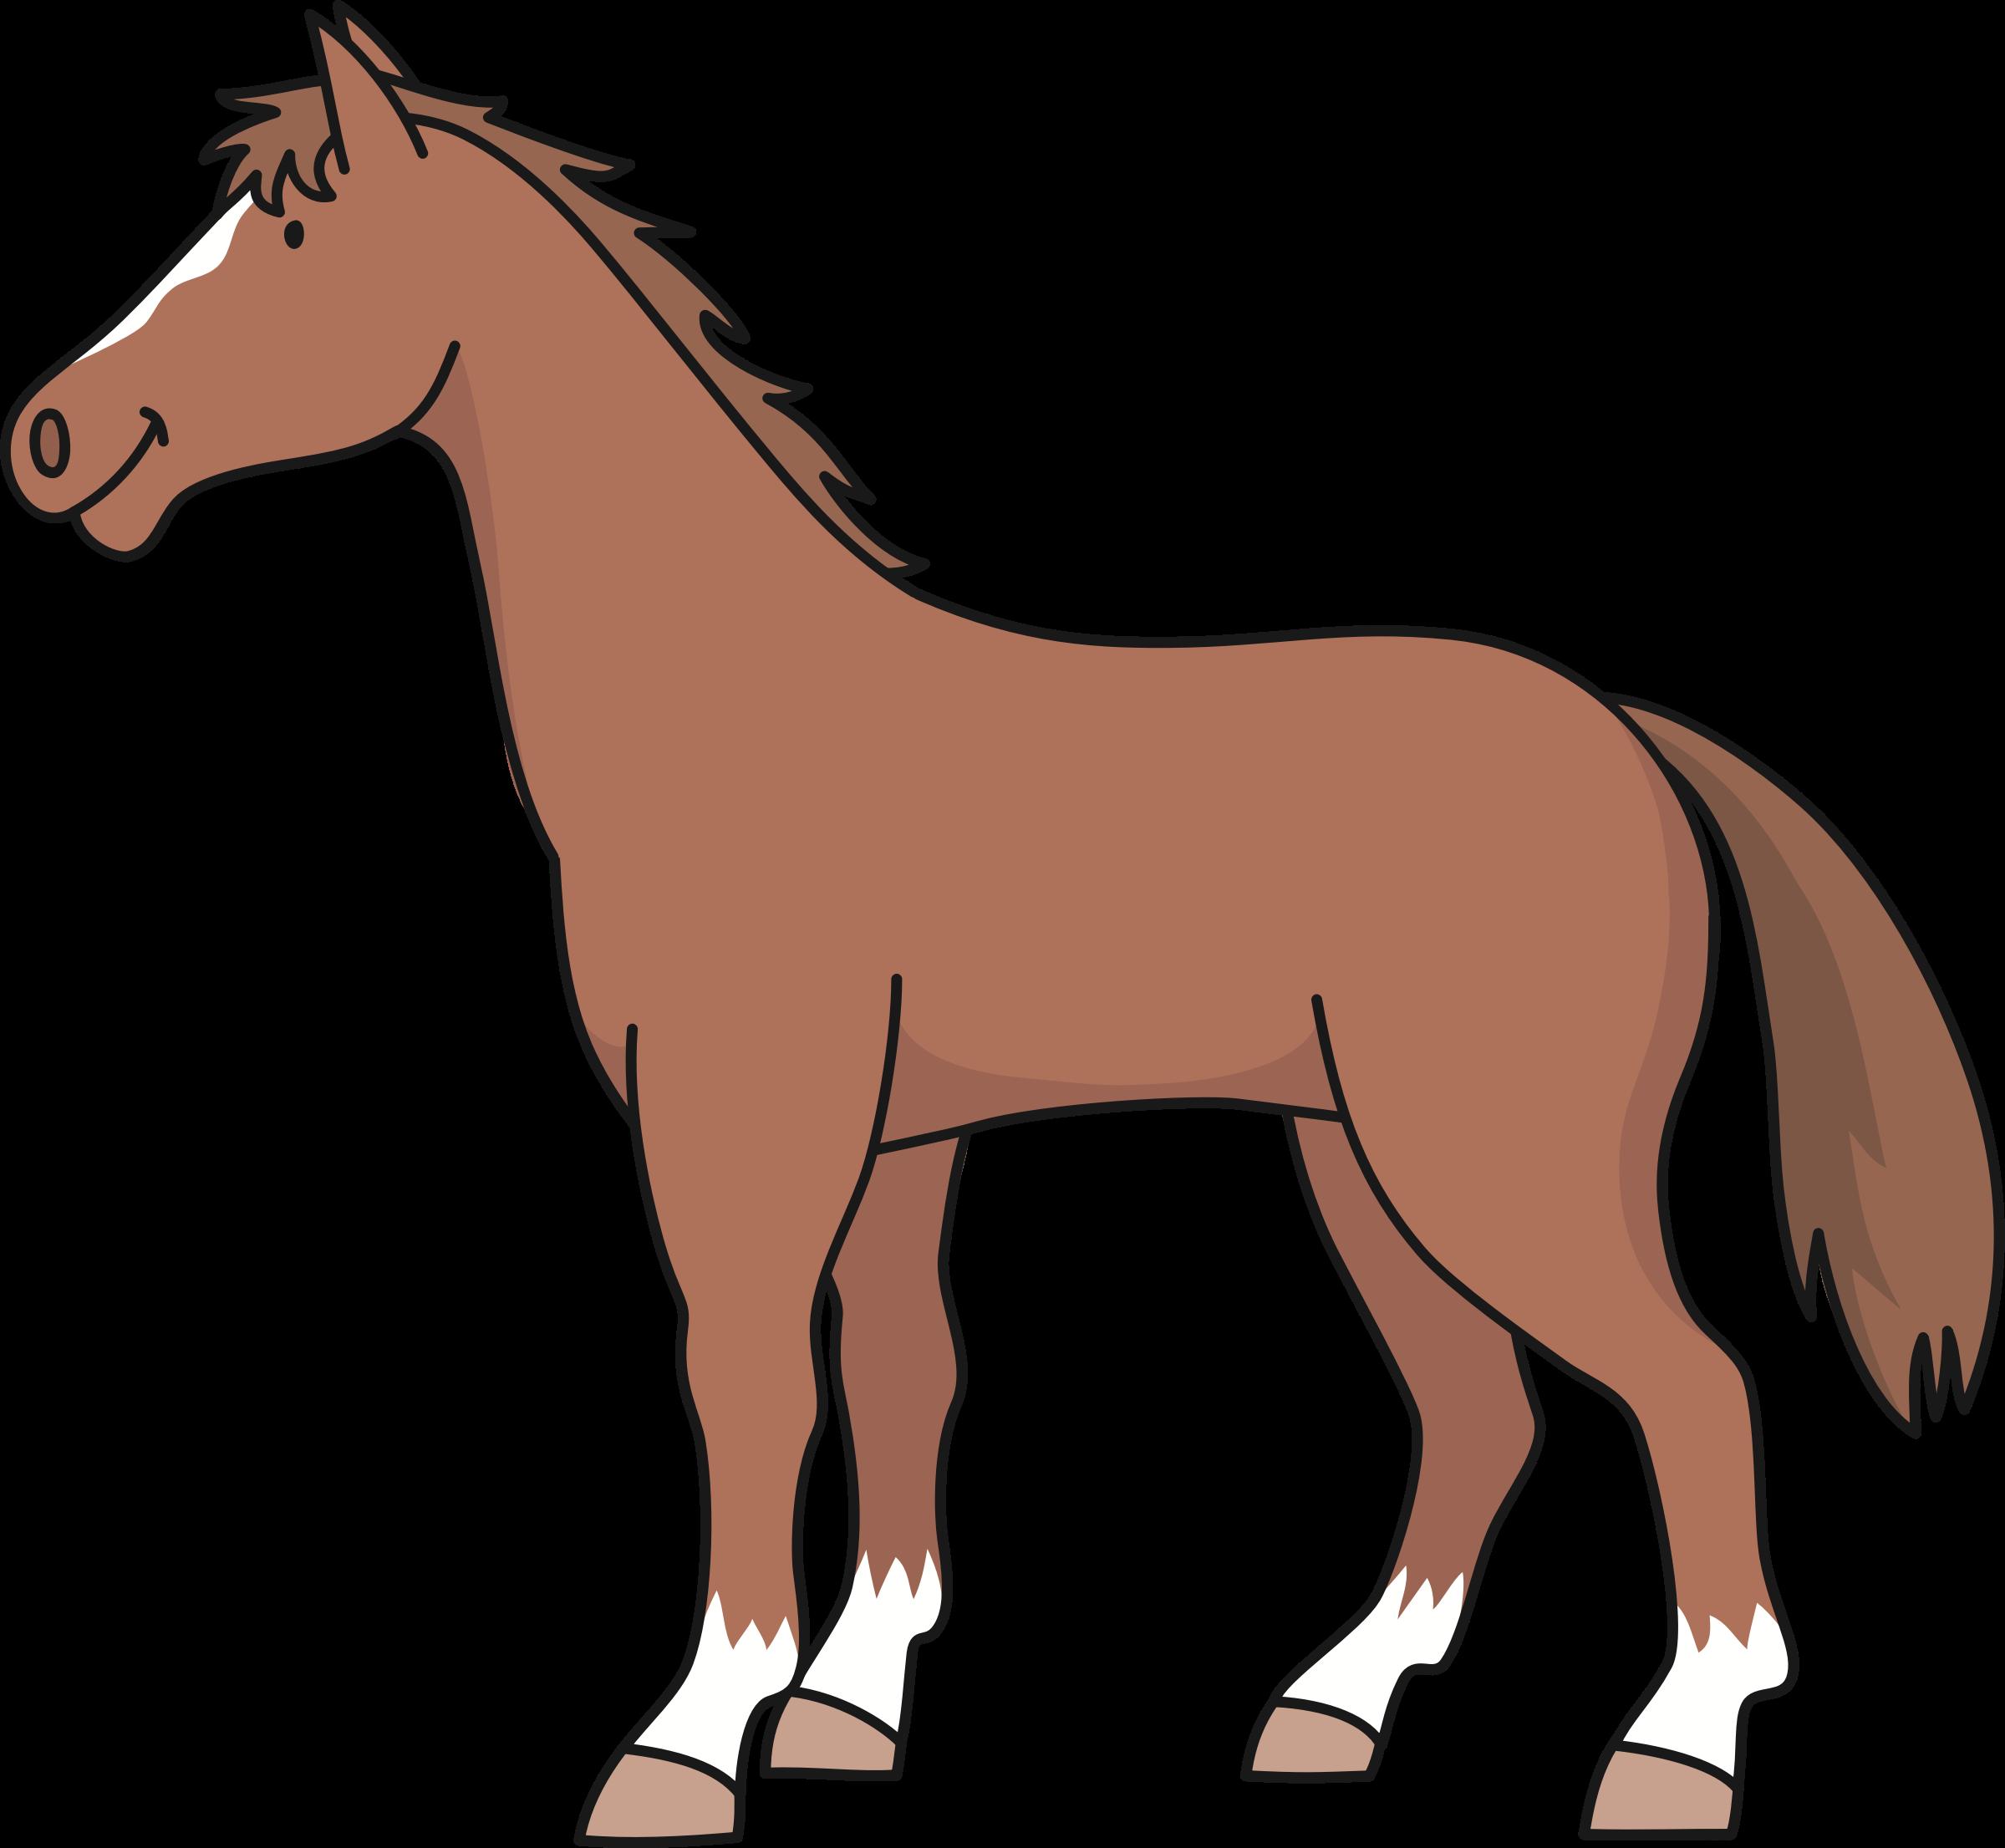 Clipart Horse Pretty Horse Clipart Horse Pretty Horse Transparent Free For Download On Webstockreview 2020